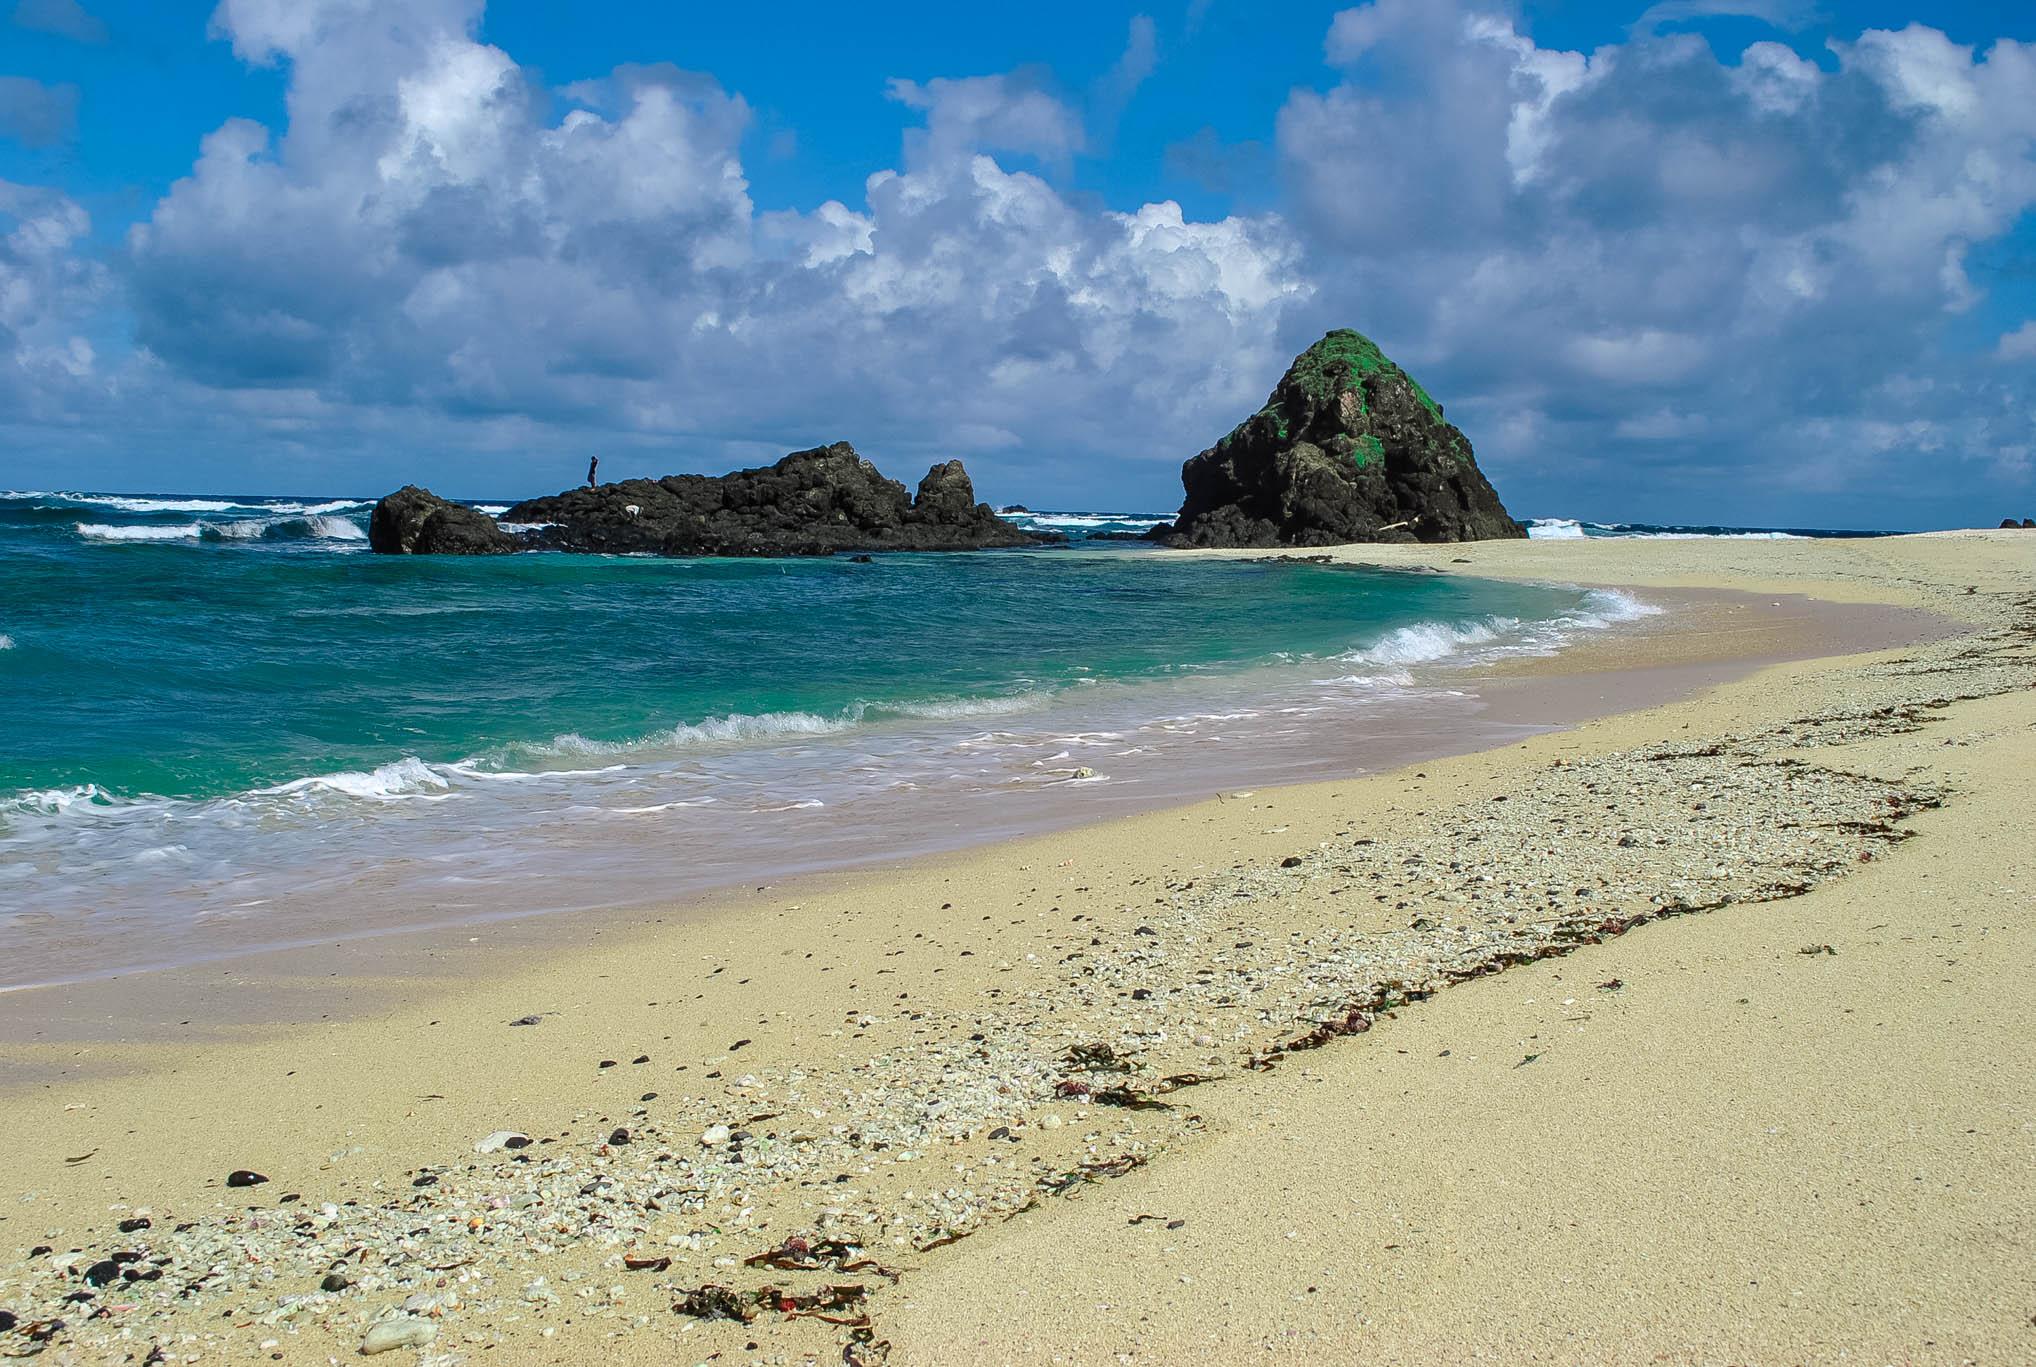 palaui island 27 (1 of 1)